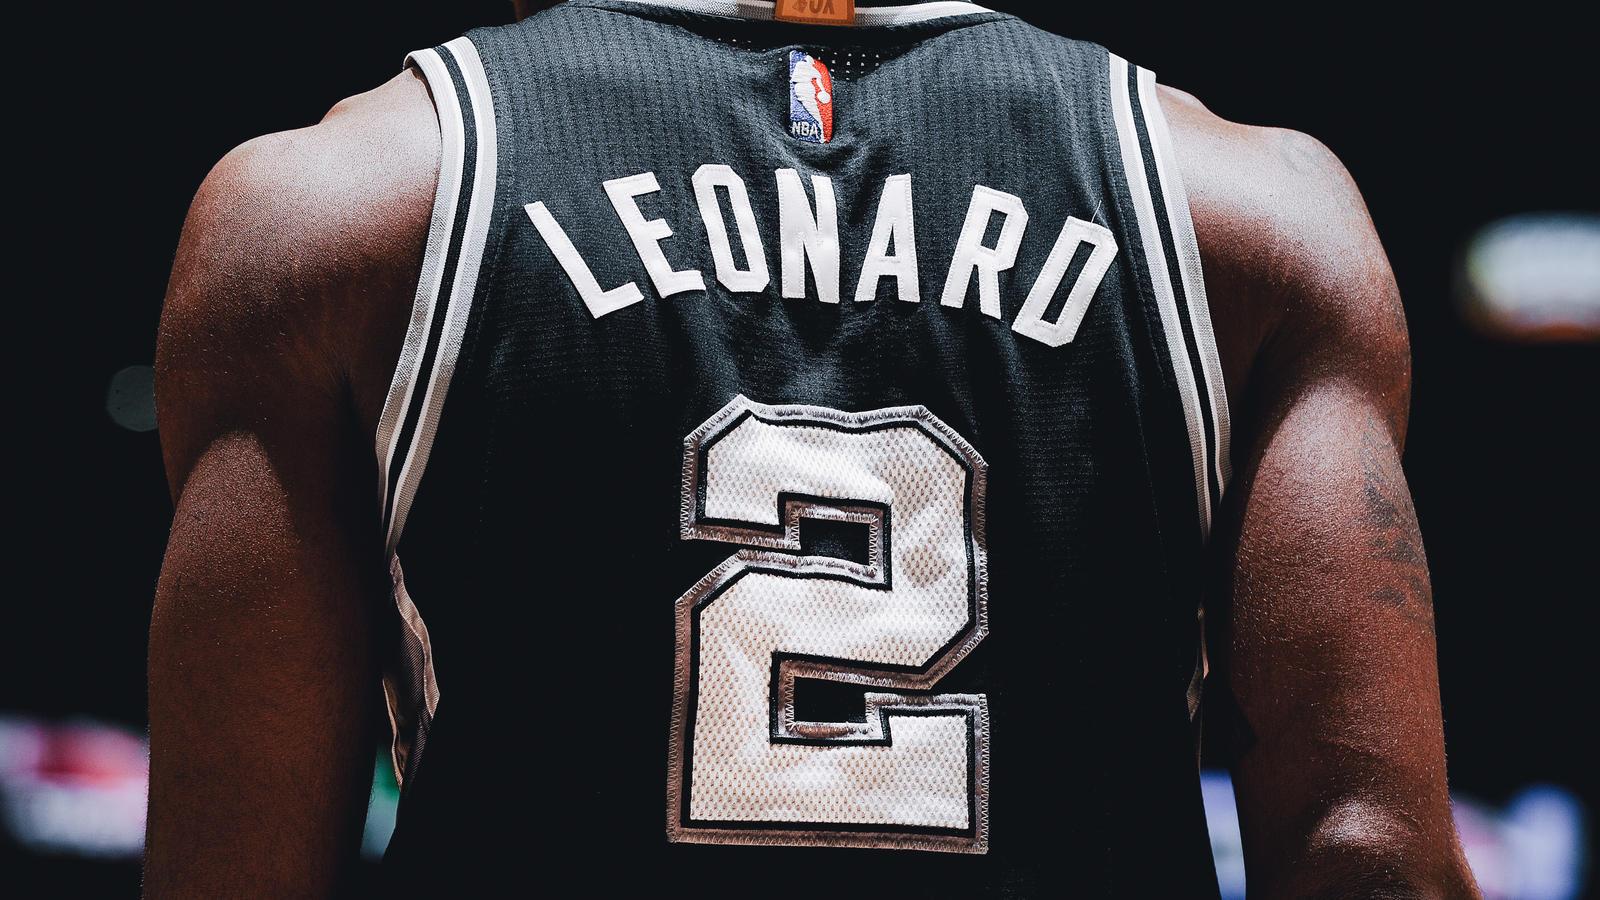 Jordan Brand Athlete Kawhi Leonard